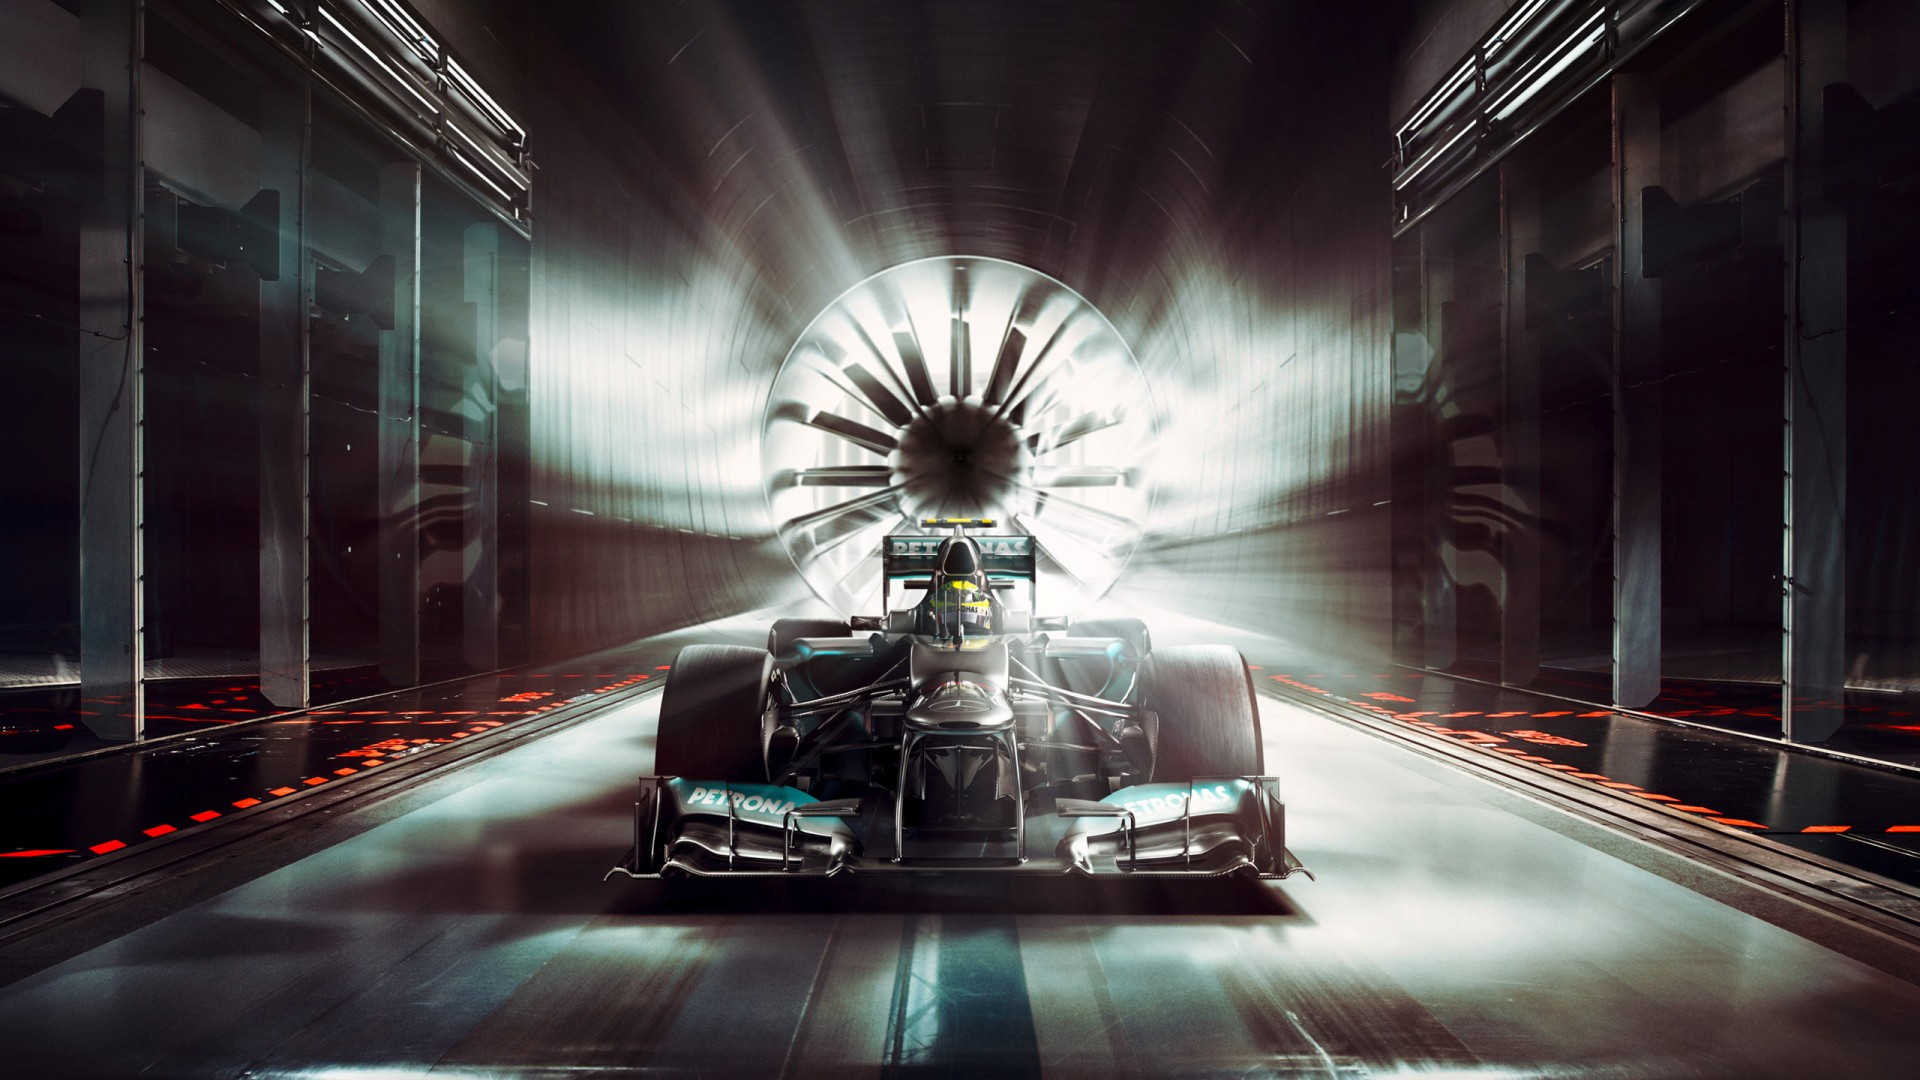 Mercedes AMG Petronas HD Wallpaper | HD Car Wallpapers ...